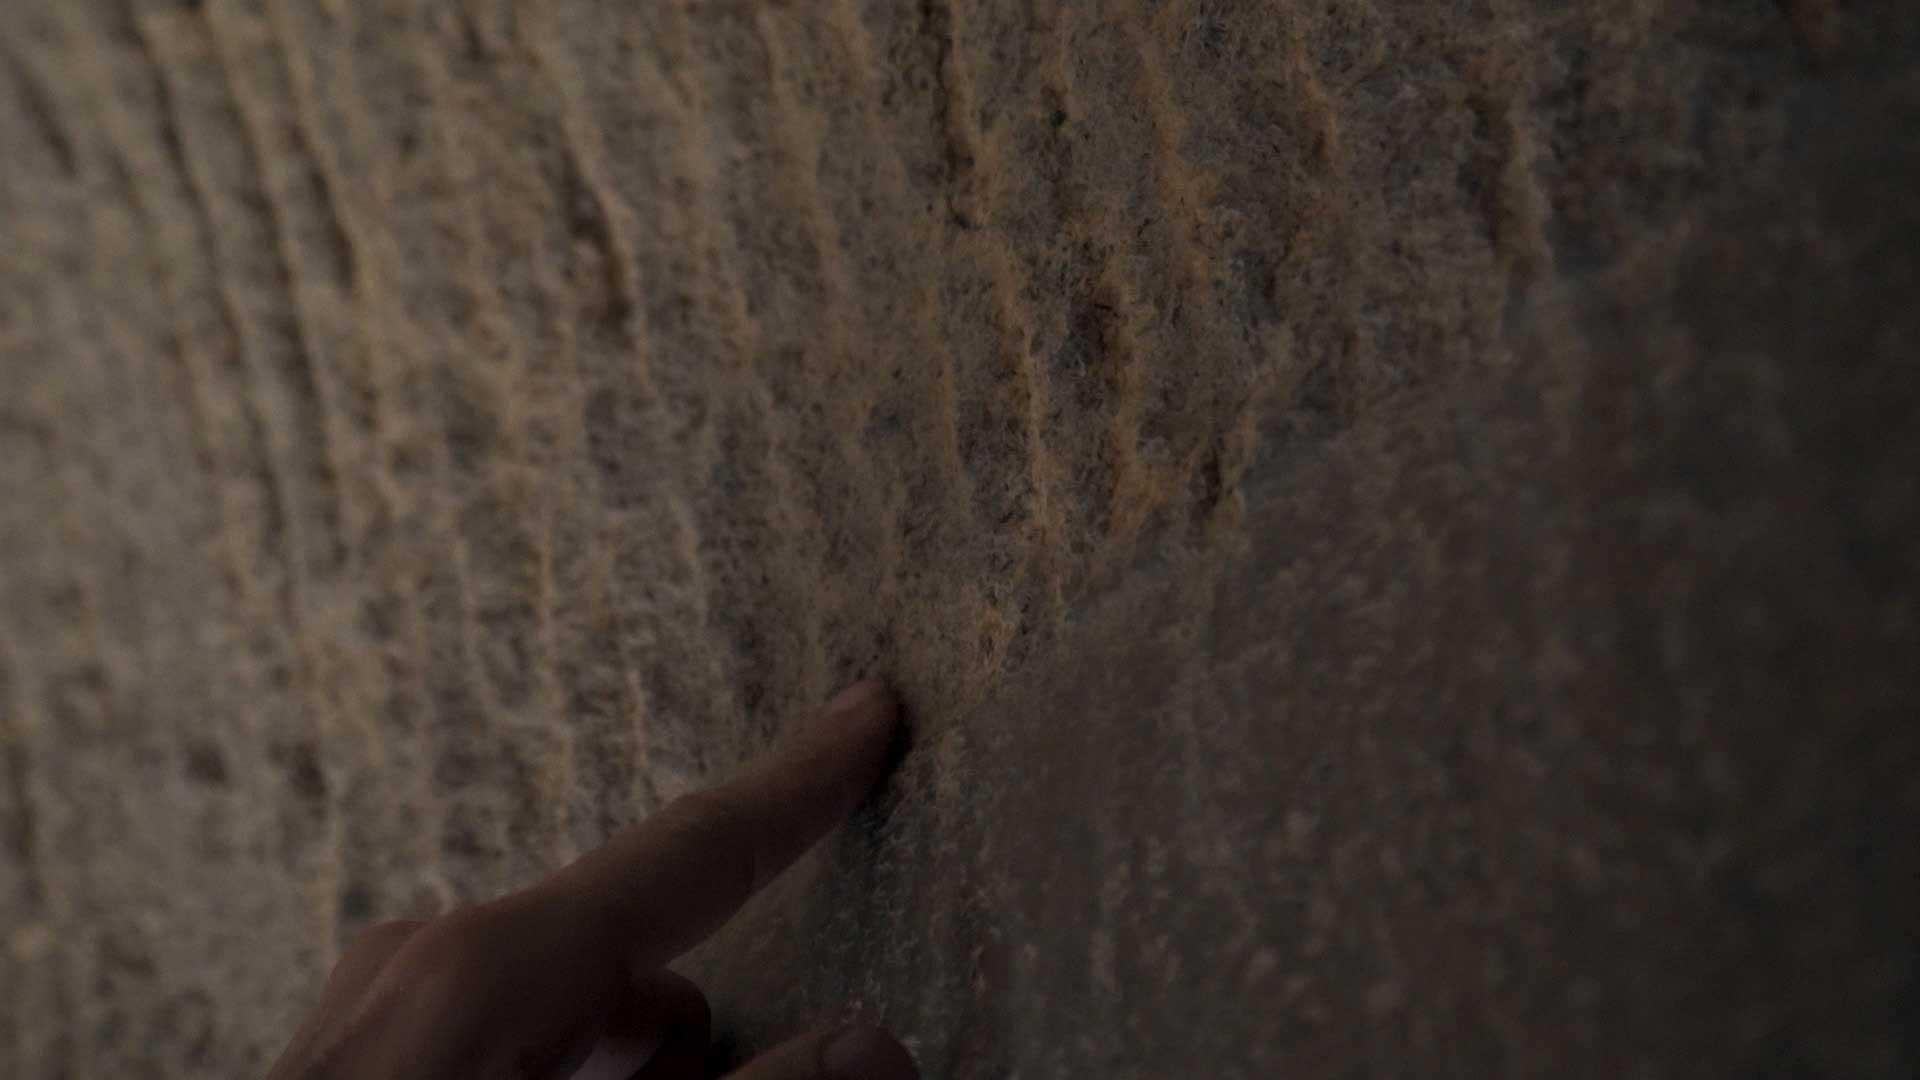 Barabar-BAM-film-granit-miroir-pyramide-inde-yoga-archeologie-22